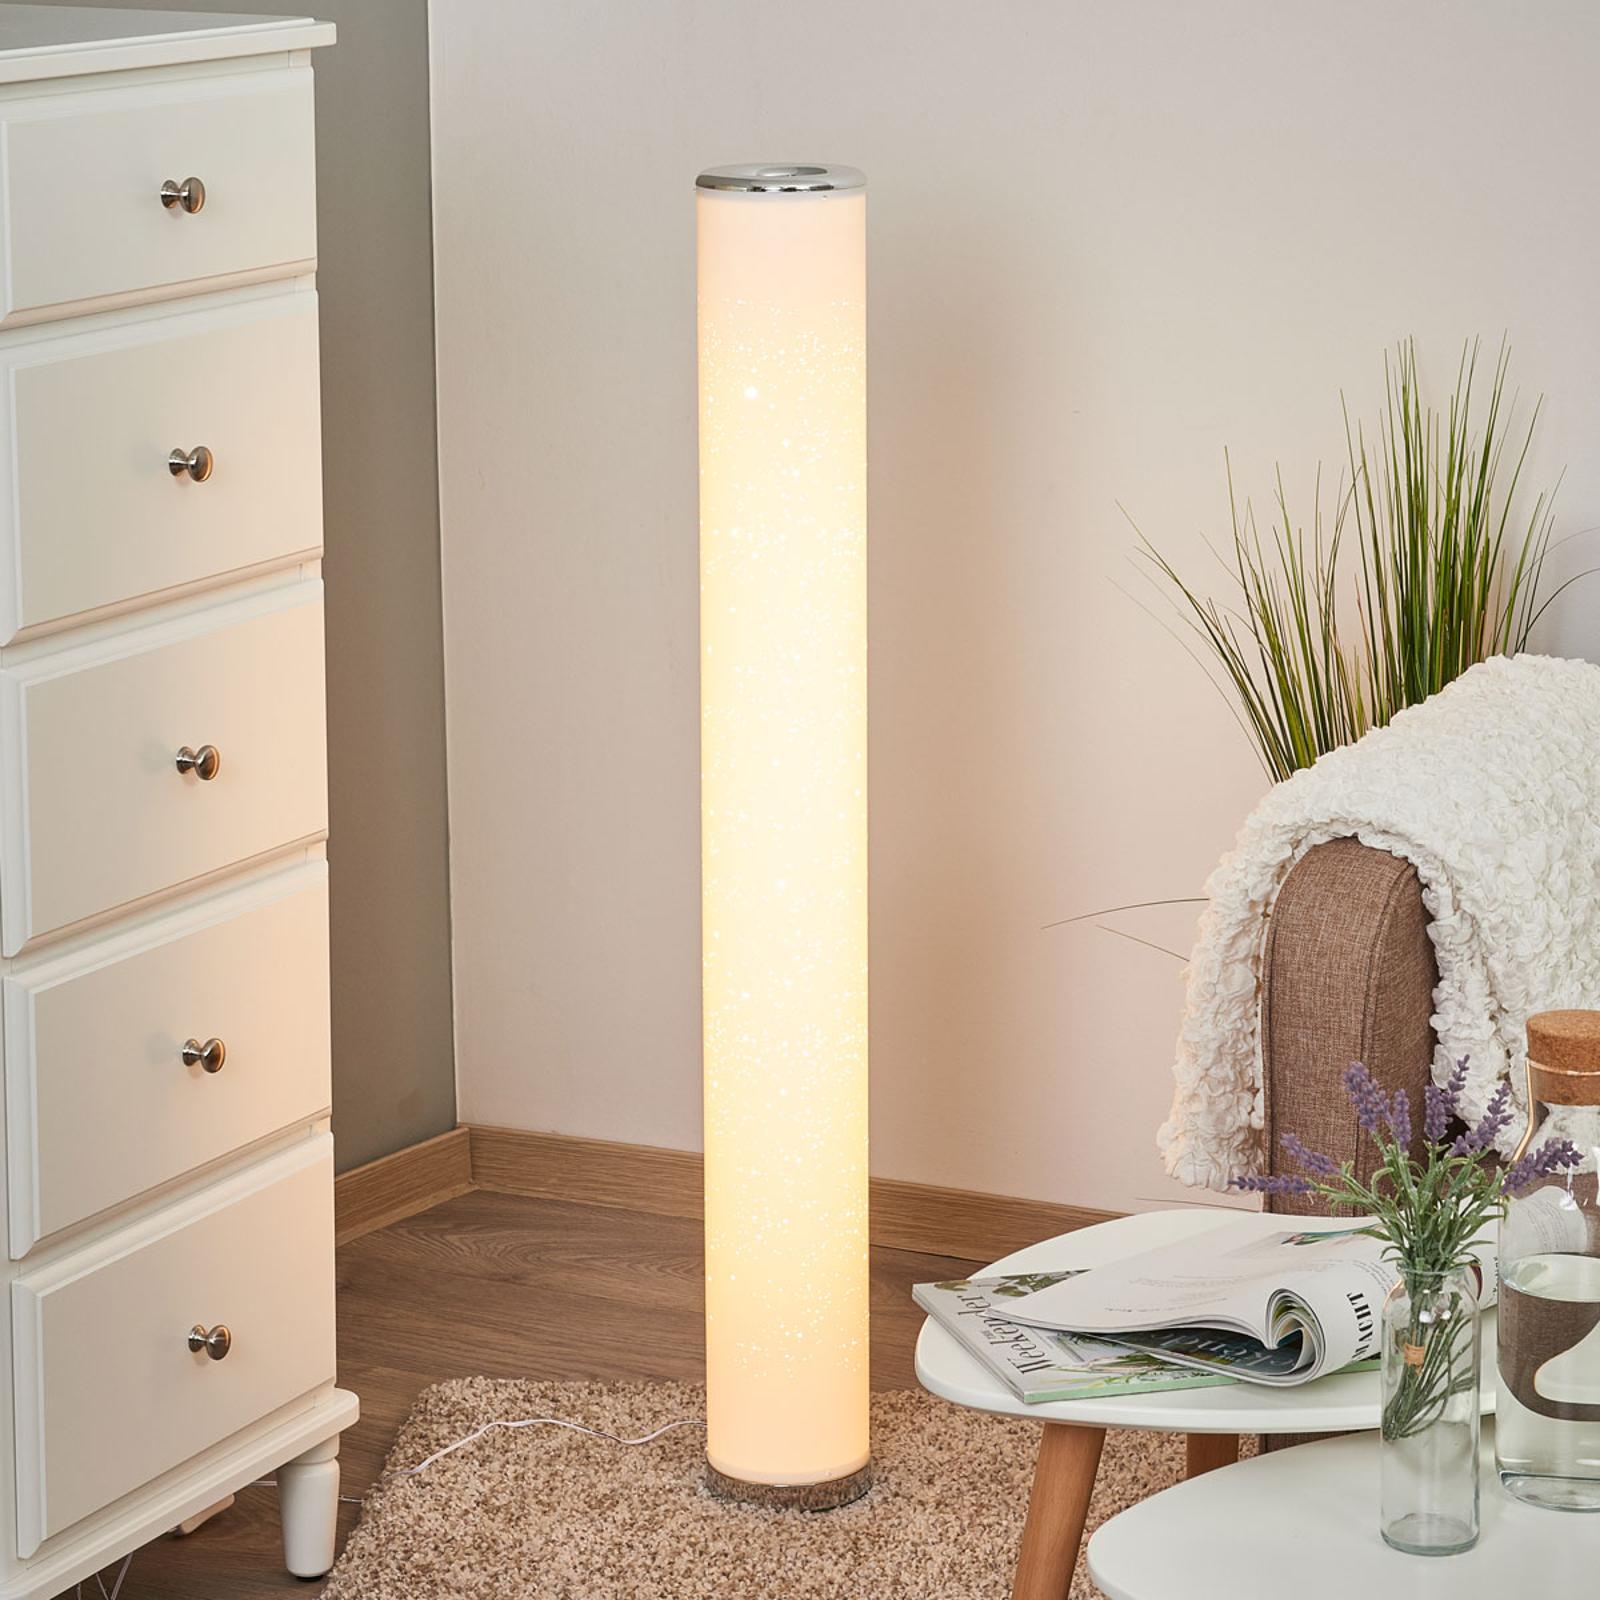 Lampadaire LED Ecris avec effet scintillant